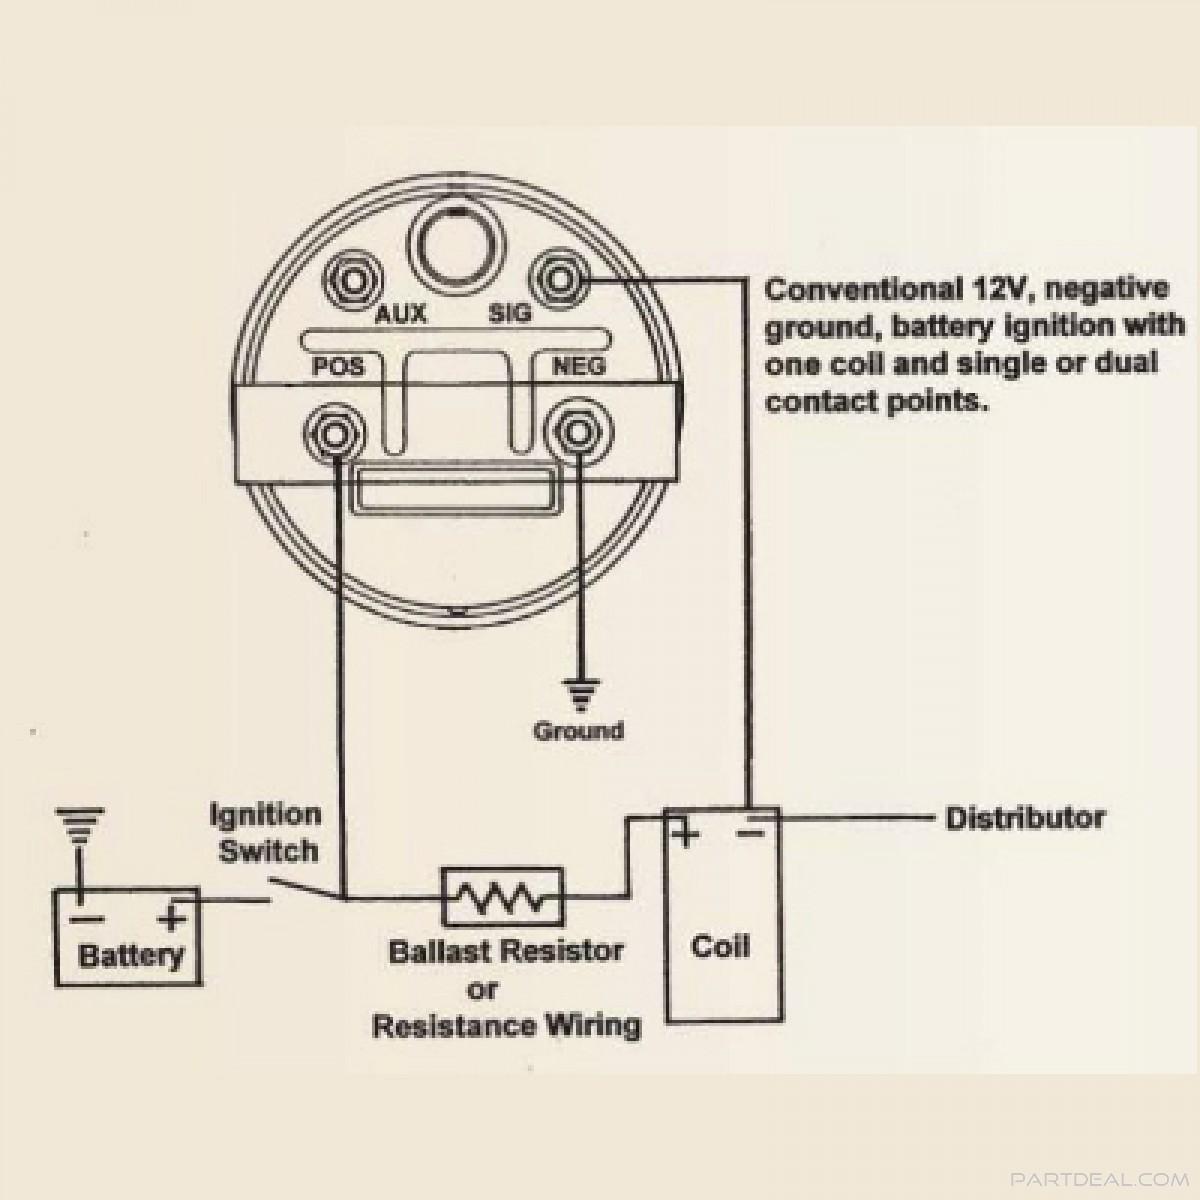 Audi Tt Fuel Gauge Wiring Diagram - 4 Channel Speaker Wiring Diagram  Ricerche Correlate A - furnaces.nescafe.jeanjaures37.fr | Audi Tt Fuel Gauge Wiring Diagram |  | Wiring Diagram Resource